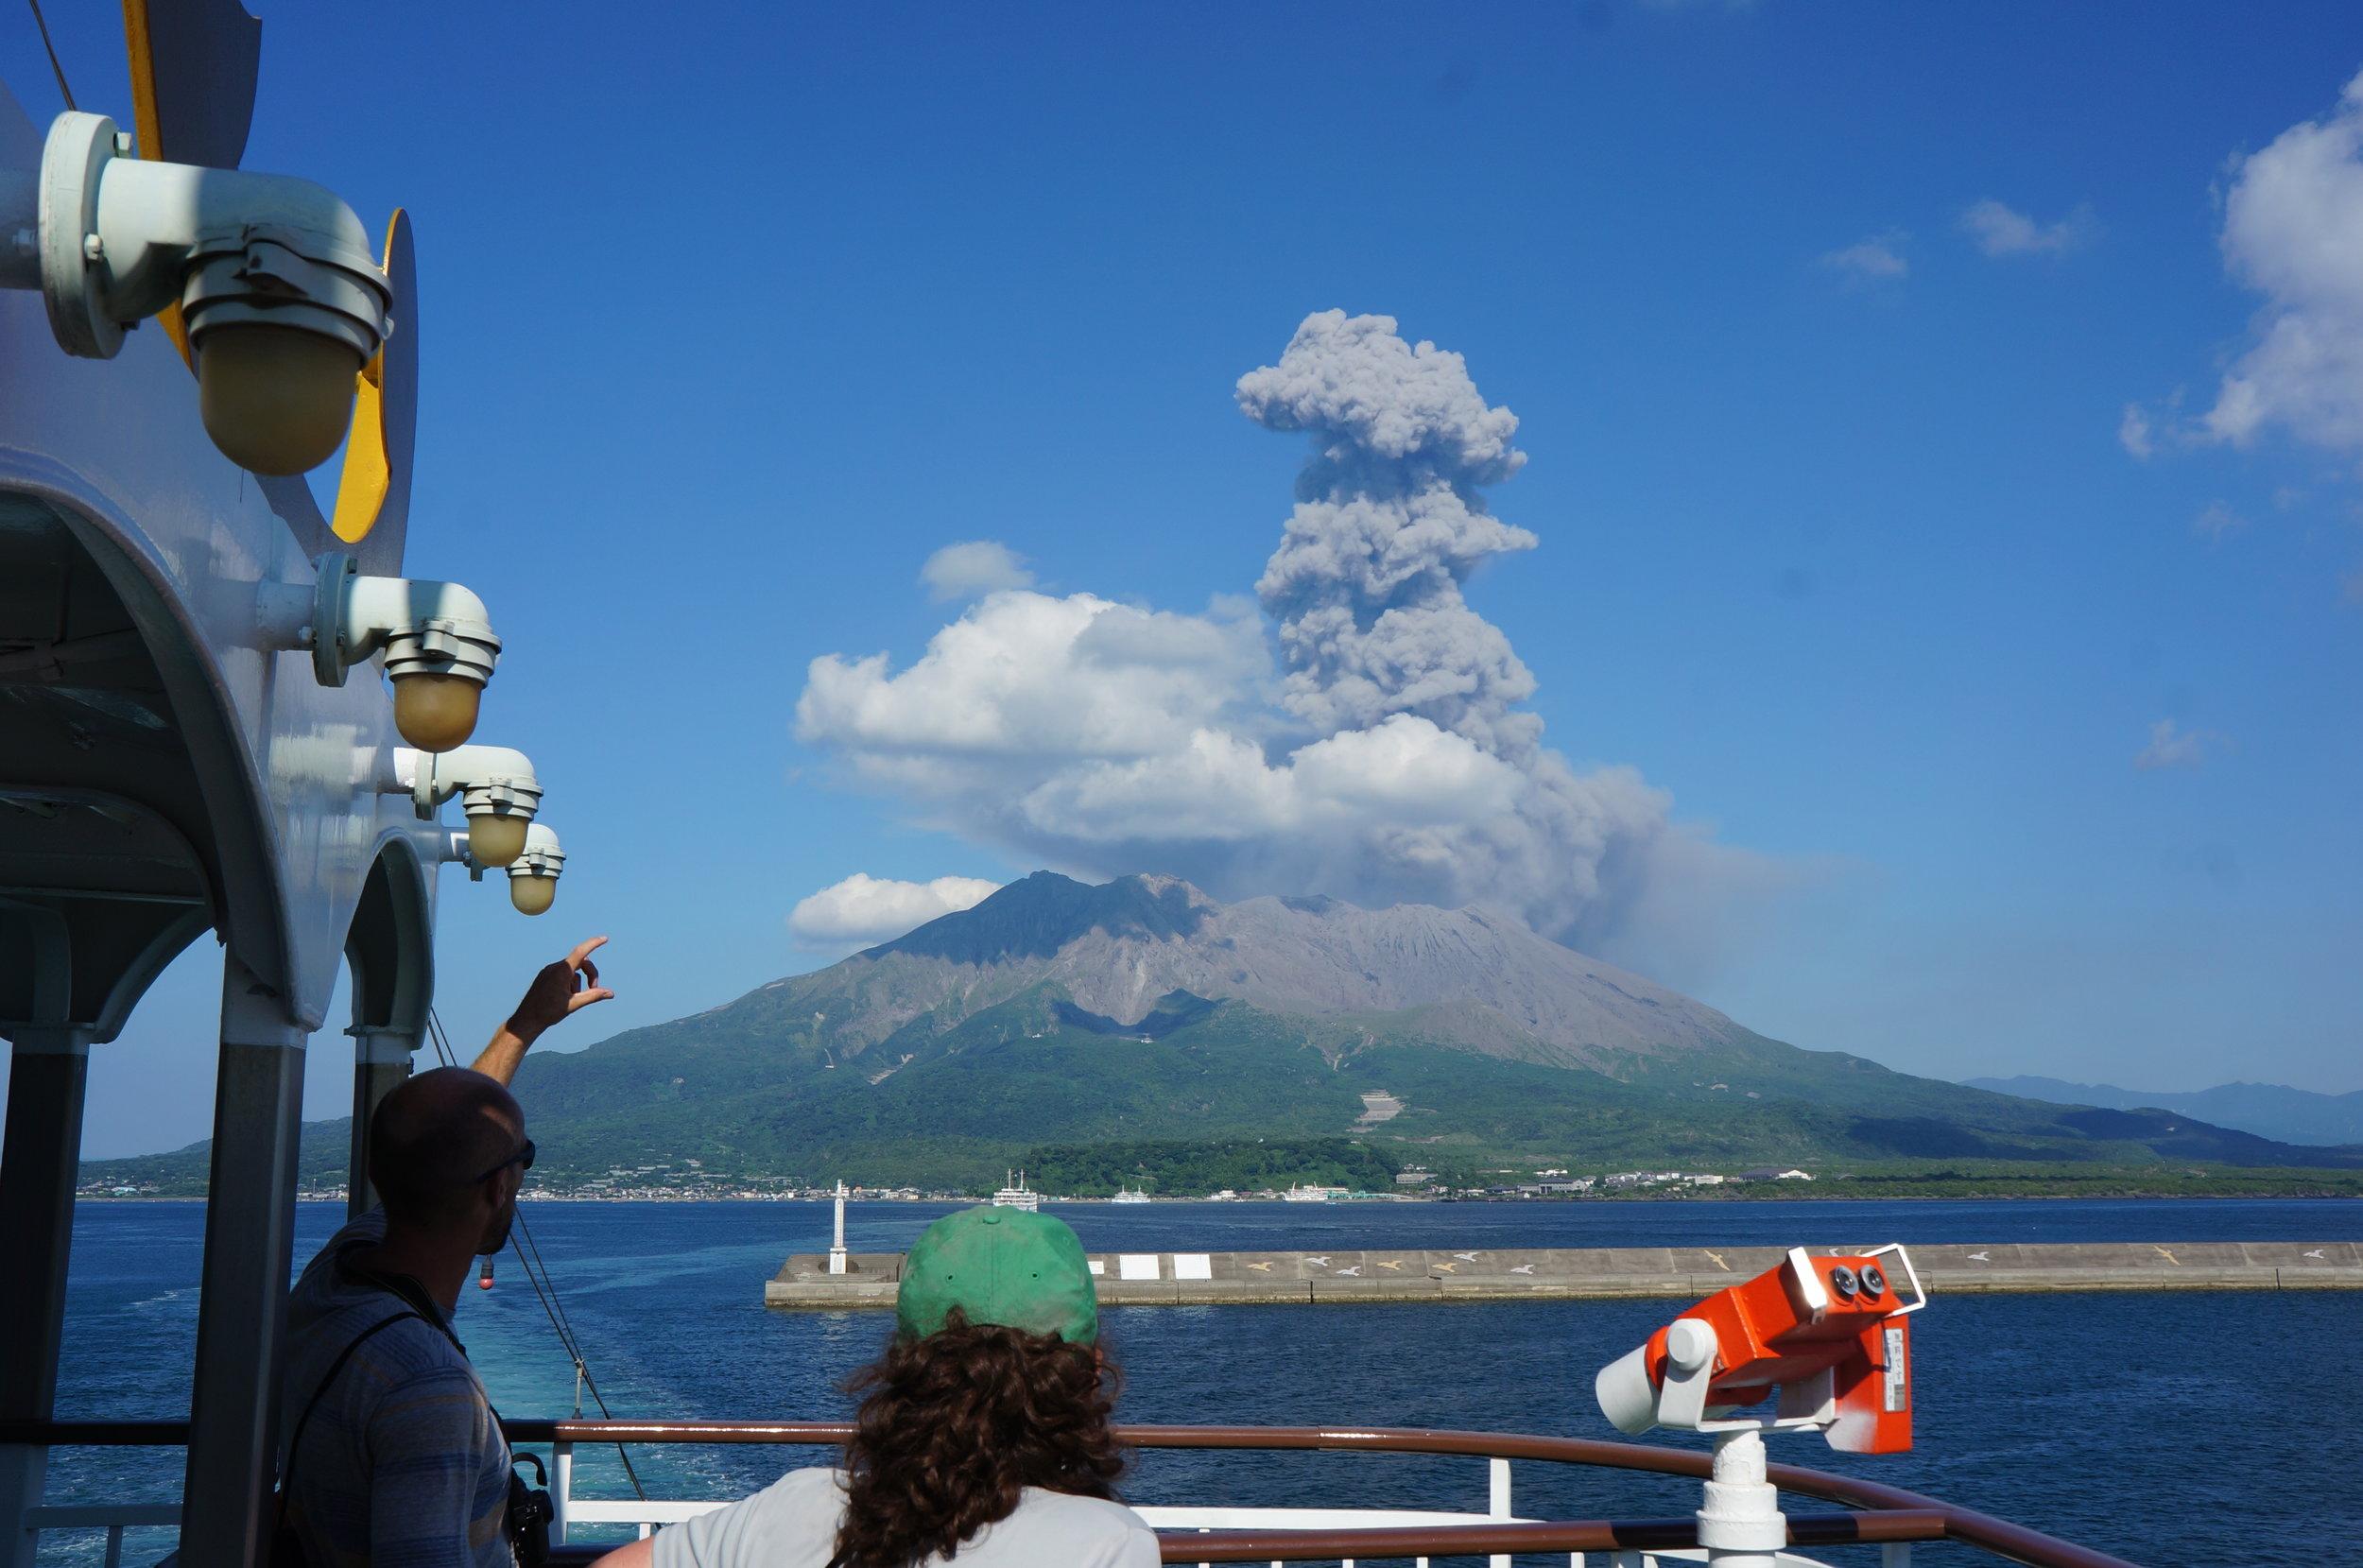 Watching eruption from ferry, Sakurajima Volcano, Japan -UAF Infrasound network deployment - July 2013, credit: C. Rowell